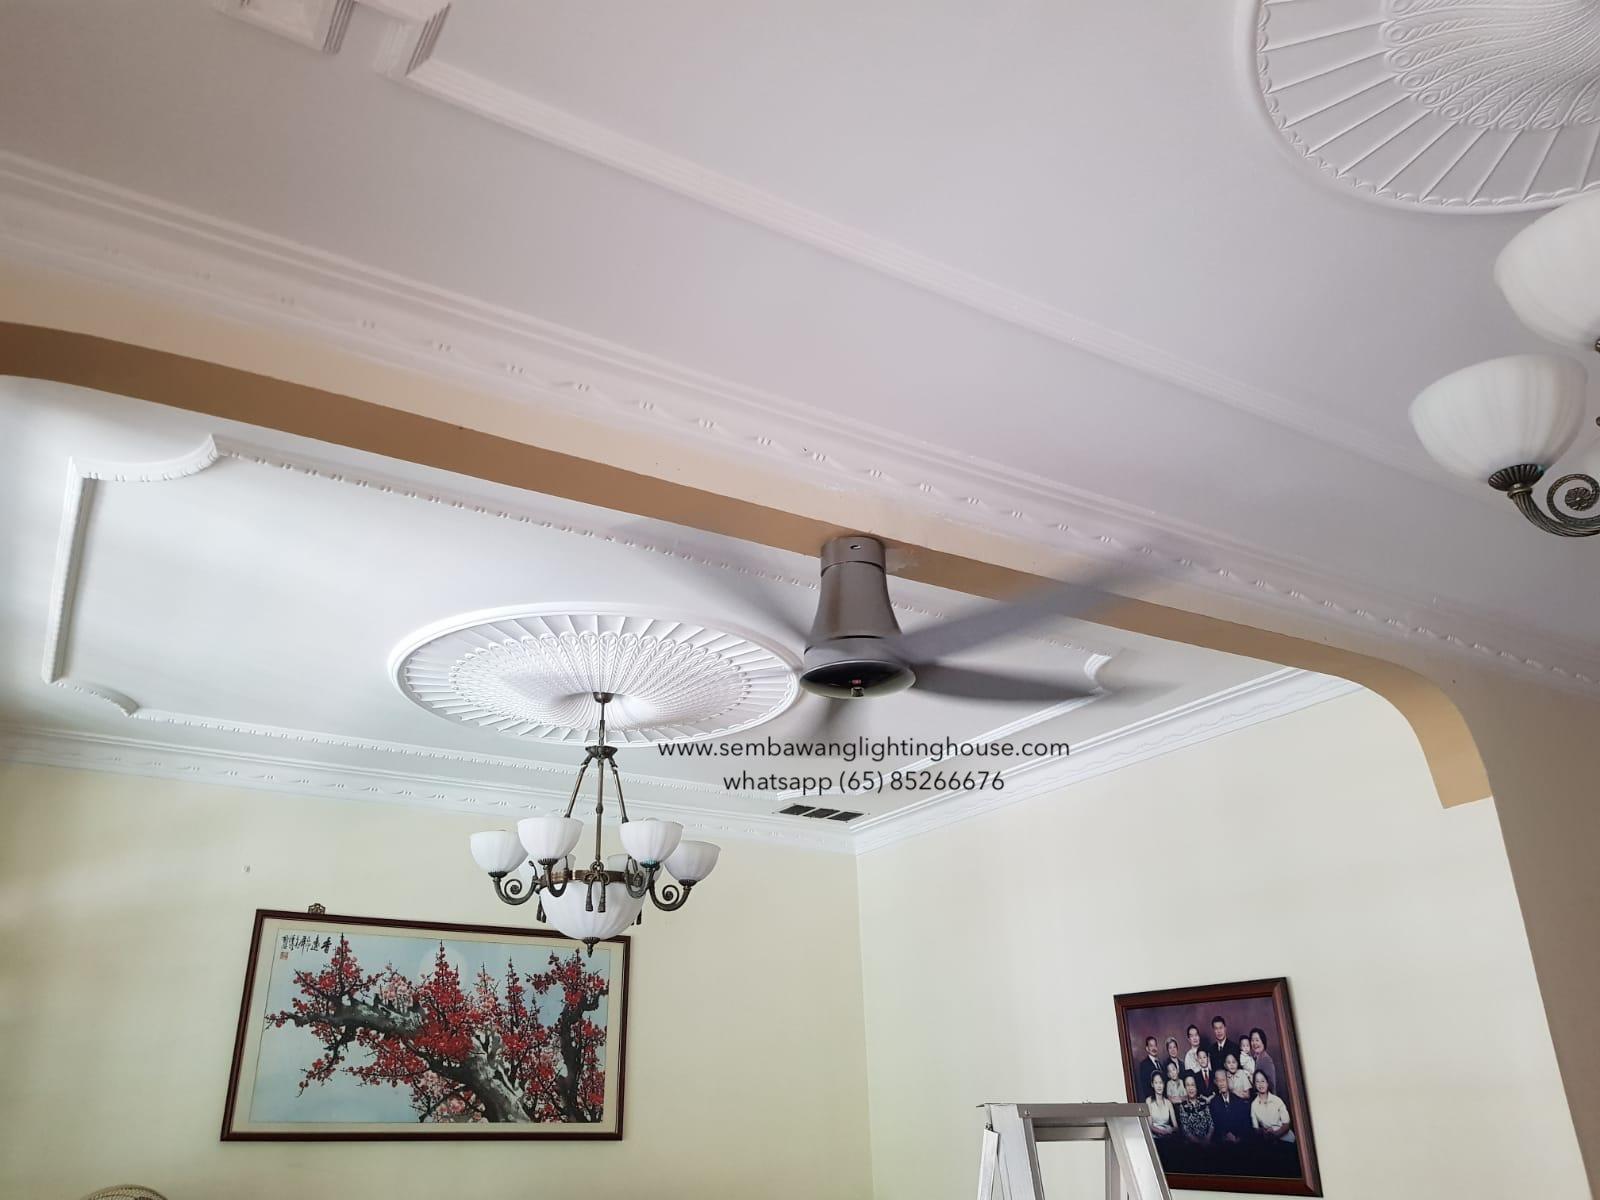 kdk-t60aw-ceiling-fan-without-light-sembawang-lighting-house-sample-07.jpg